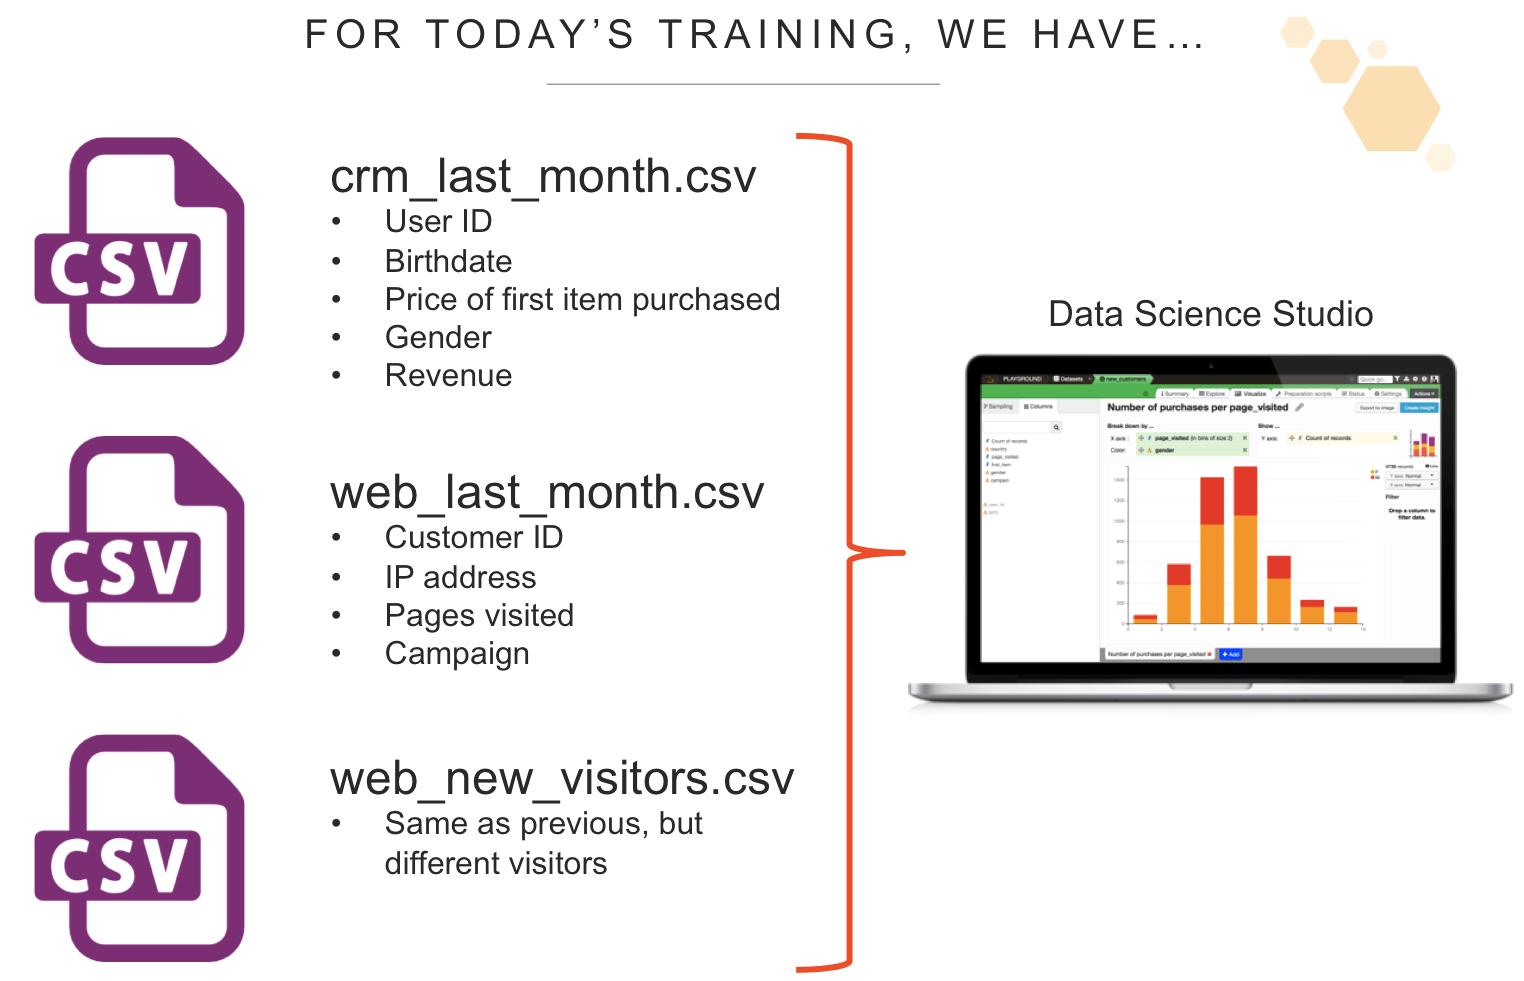 crm data for training